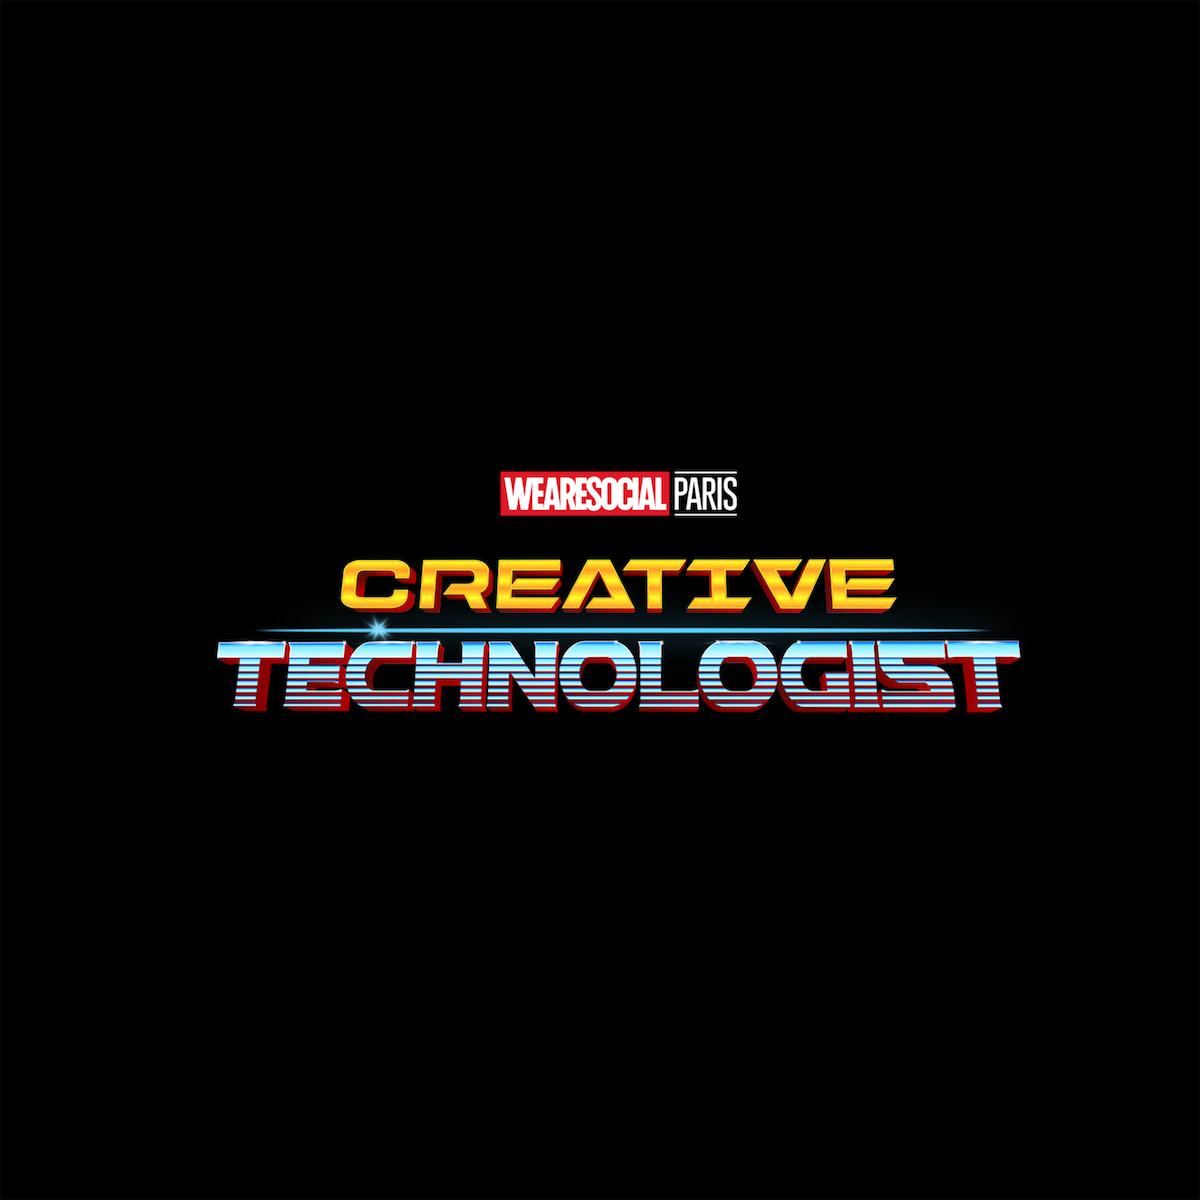 Superhero Logos for creative agency job titles - Creative Technologist / Thor